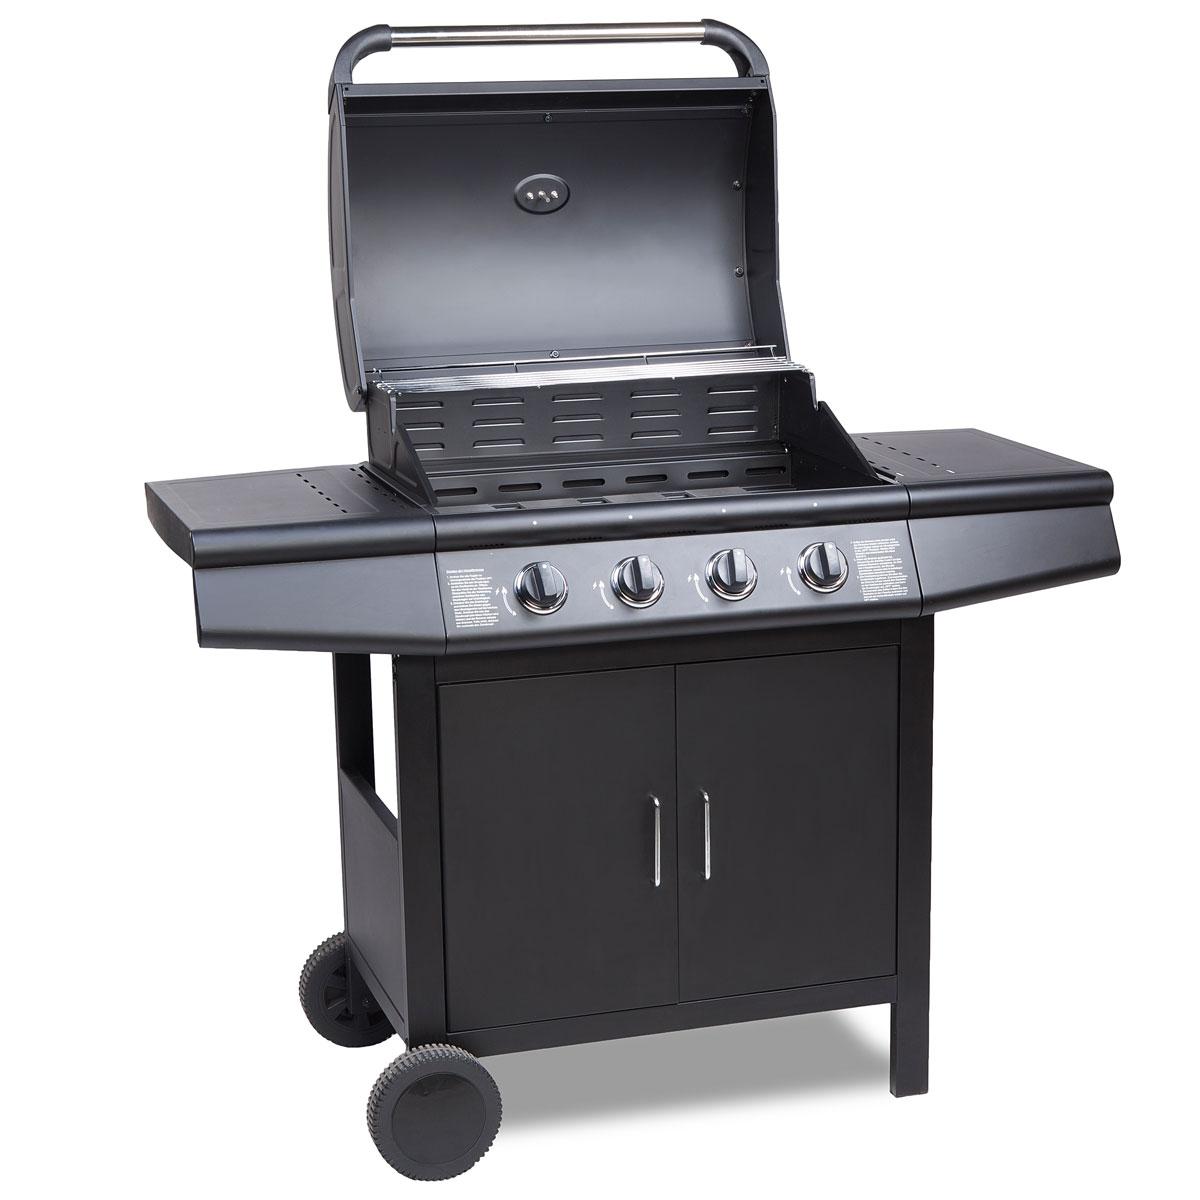 gasgrill bbq grillwagen 4 edelstahl brenner gas barbeque grill neu schwarz ebay. Black Bedroom Furniture Sets. Home Design Ideas